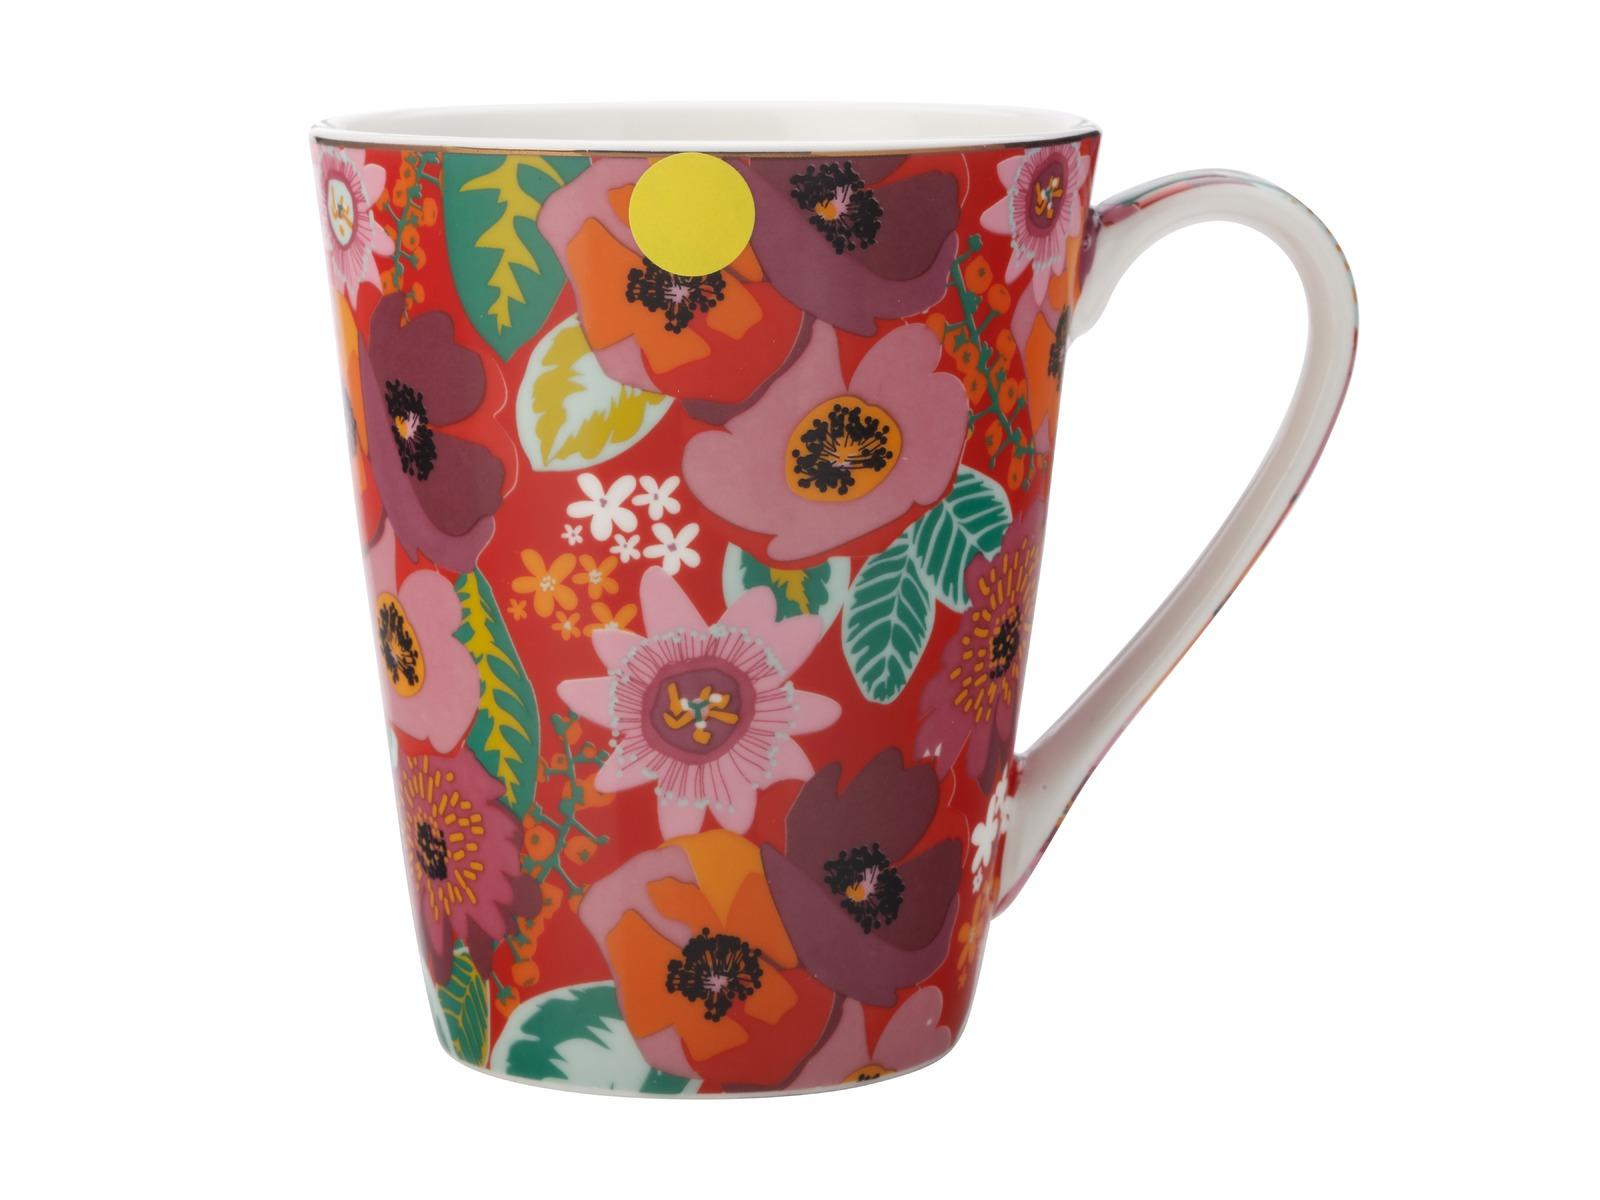 Maxwell & Williams: Teas & C's Glastonbury Mug - Poppy Red (360ml) image